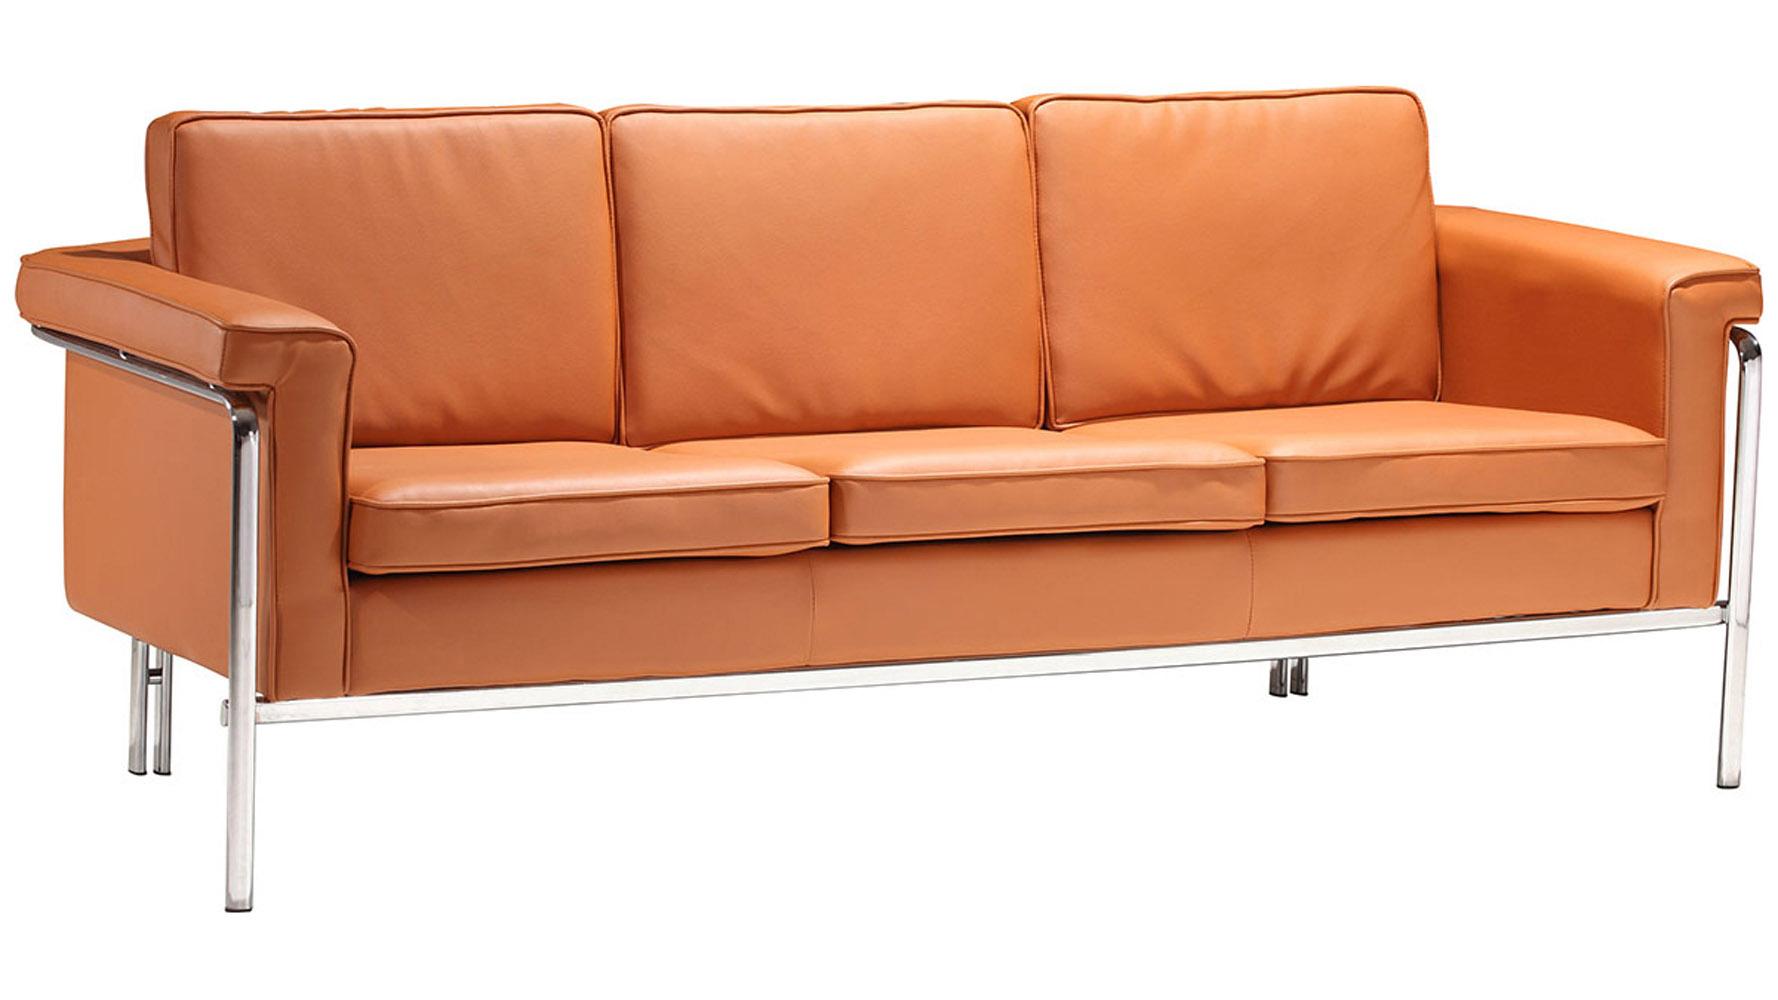 bassett sofa zuri furniture. Black Bedroom Furniture Sets. Home Design Ideas